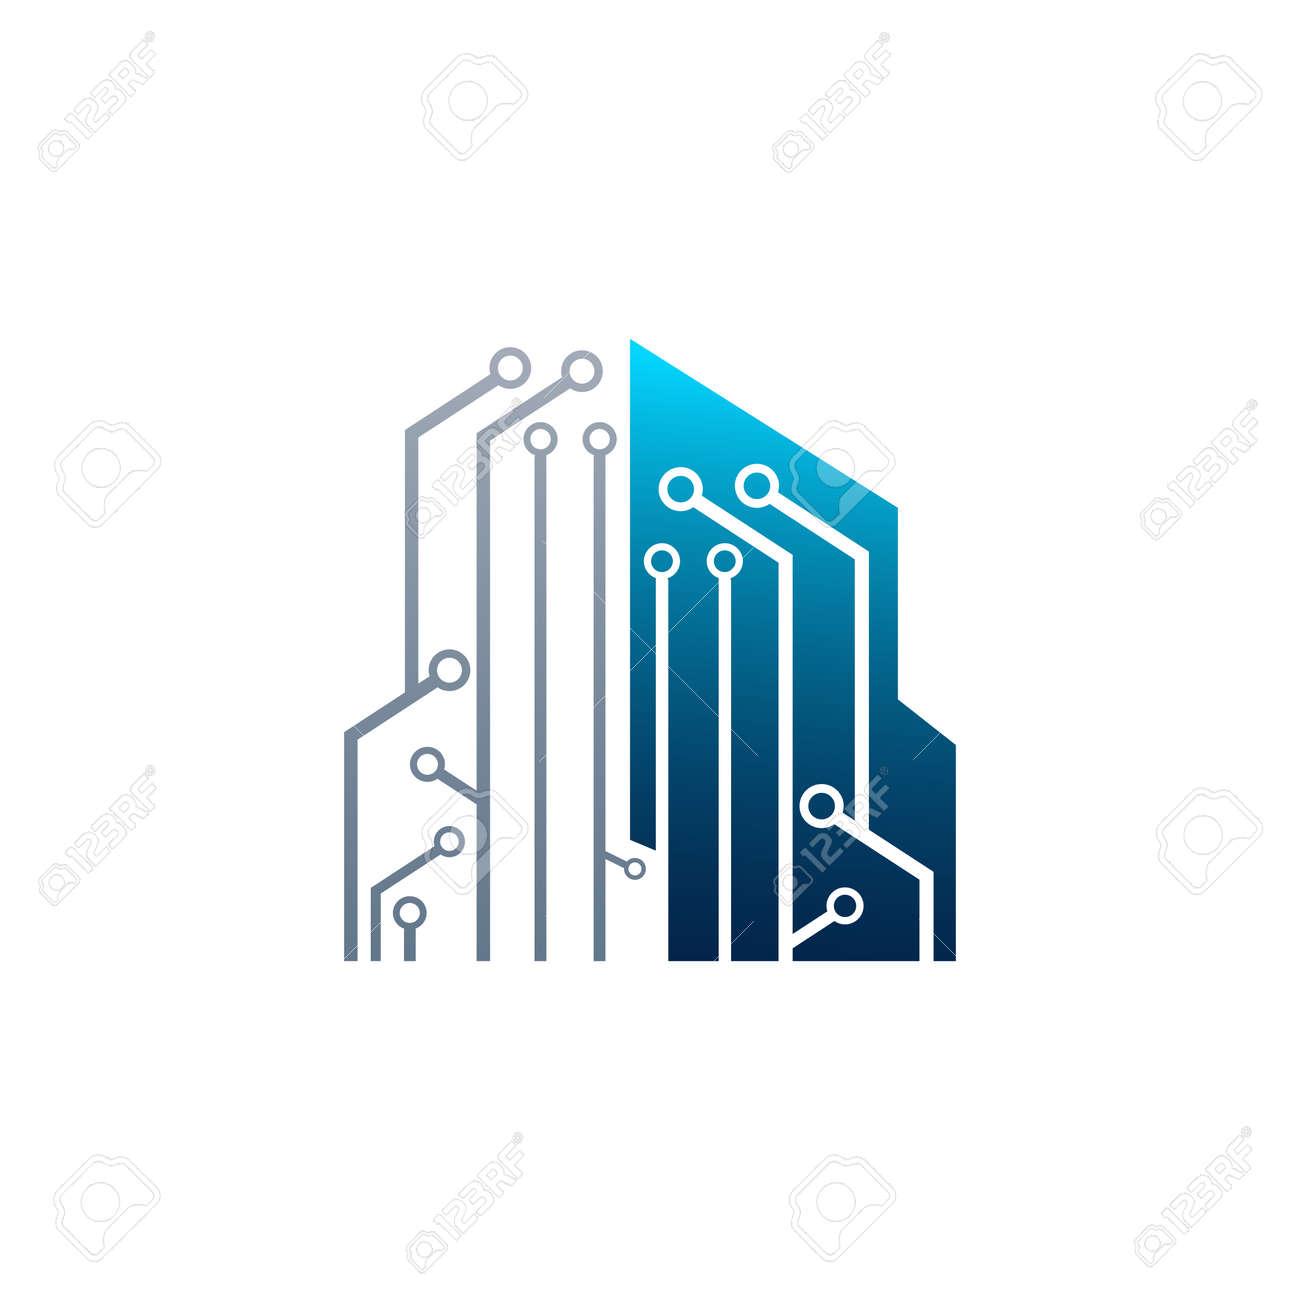 circuit tech element electronics icon digital electronics logocircuit tech element electronics icon digital electronics logo design creative electronic circuits logo